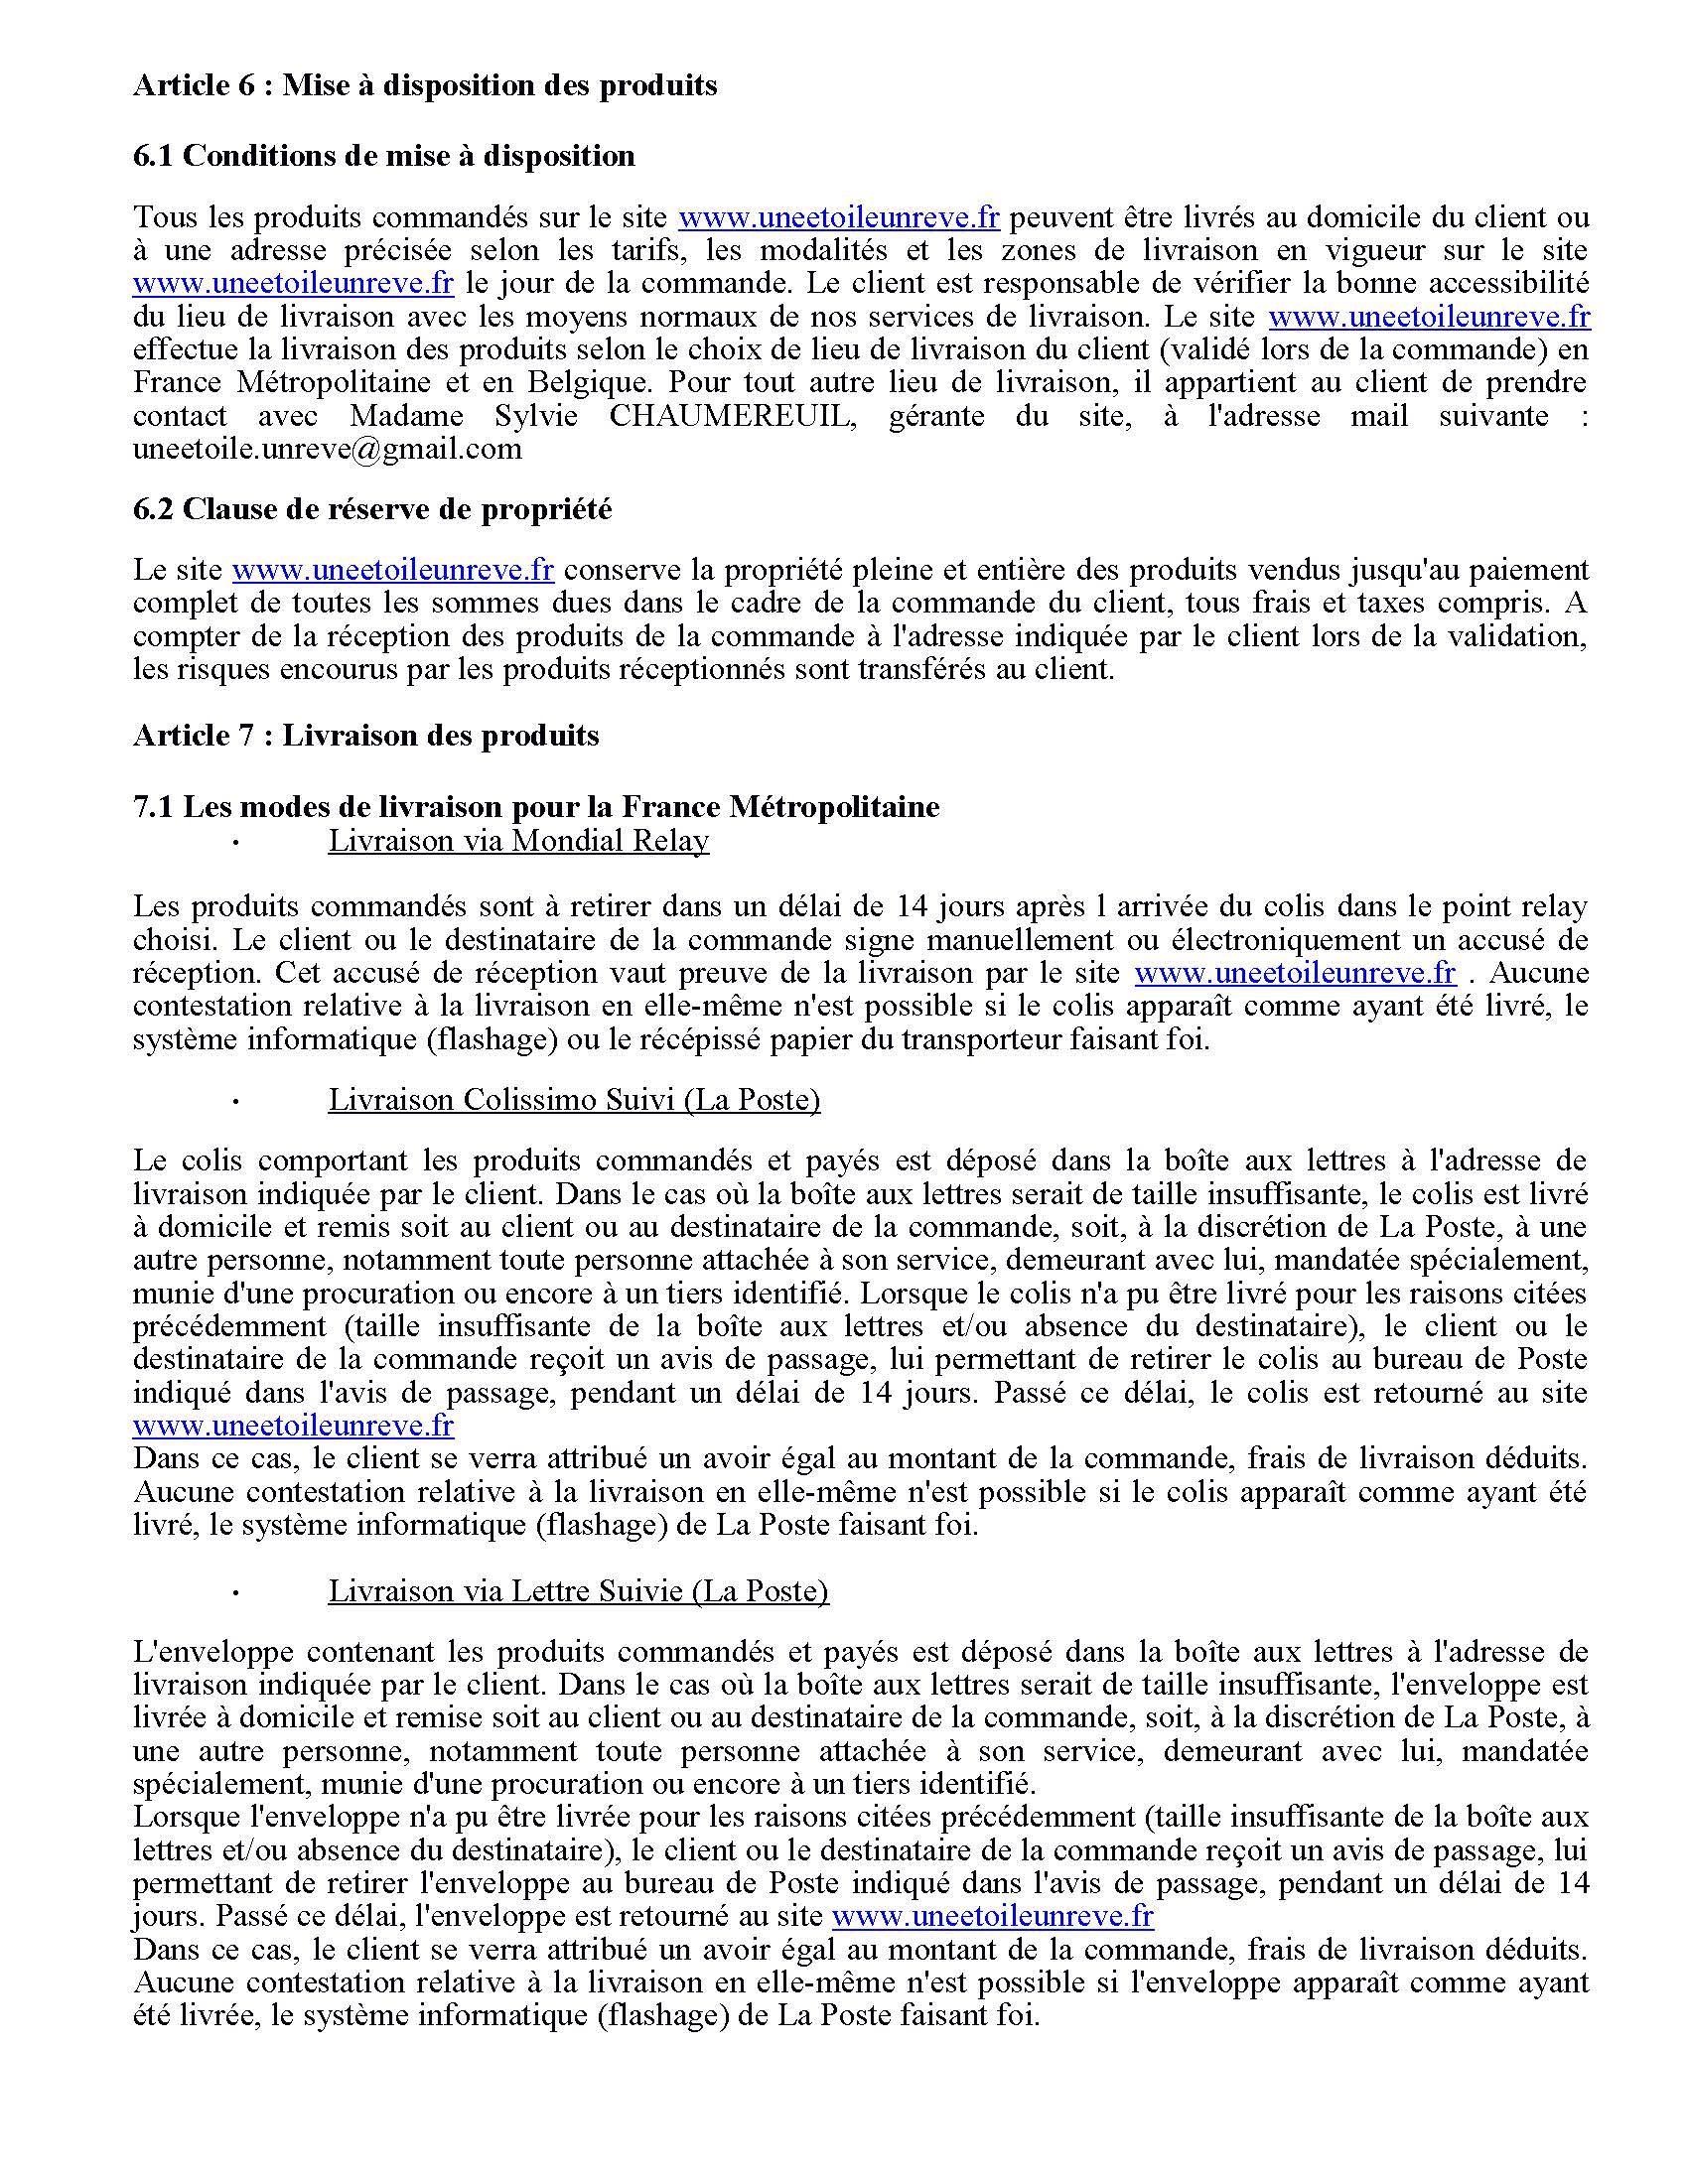 CGV_www.uneetoileunreve.fr_Page_06.jpg